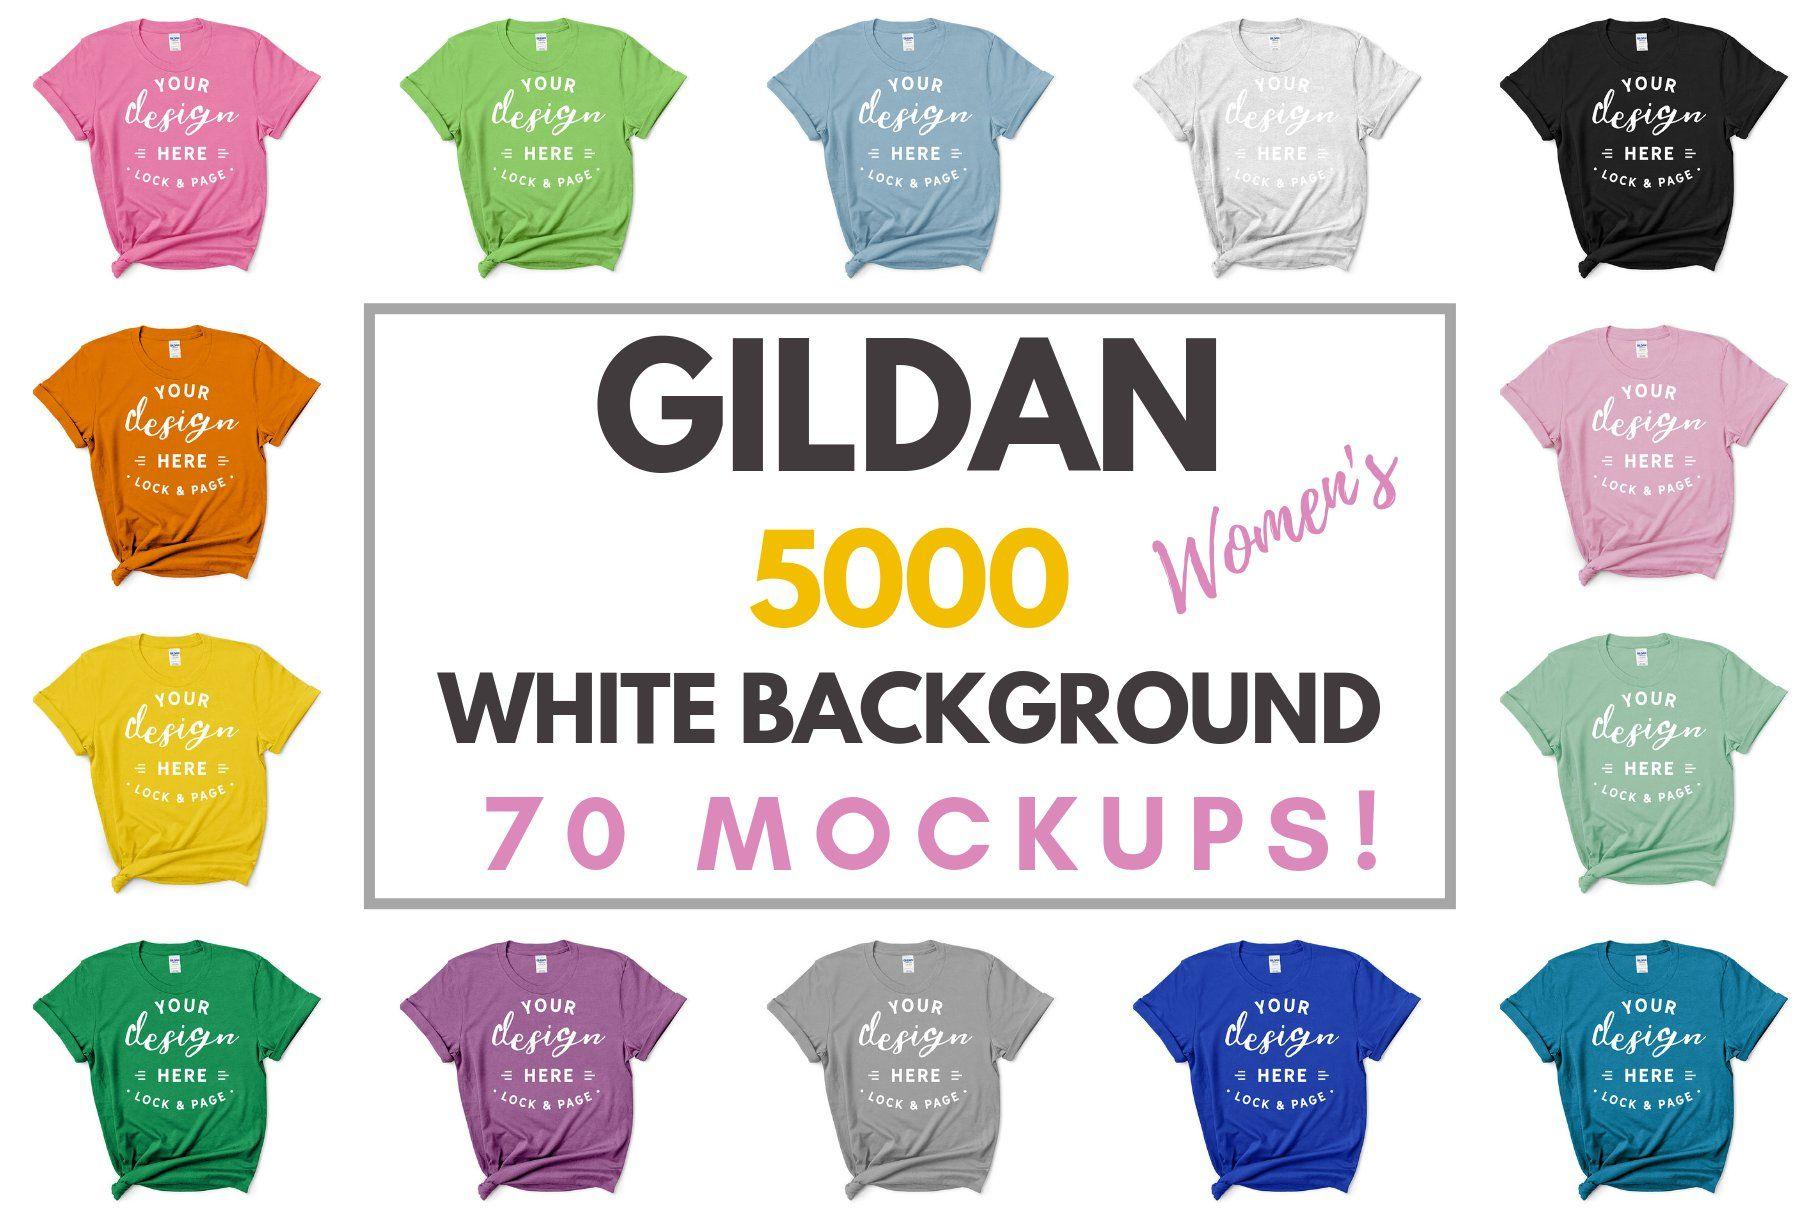 Download Female Gildan 5000 Mockup Bundle Tshirt Mockup Design Mockup Free Psd Mockup Template